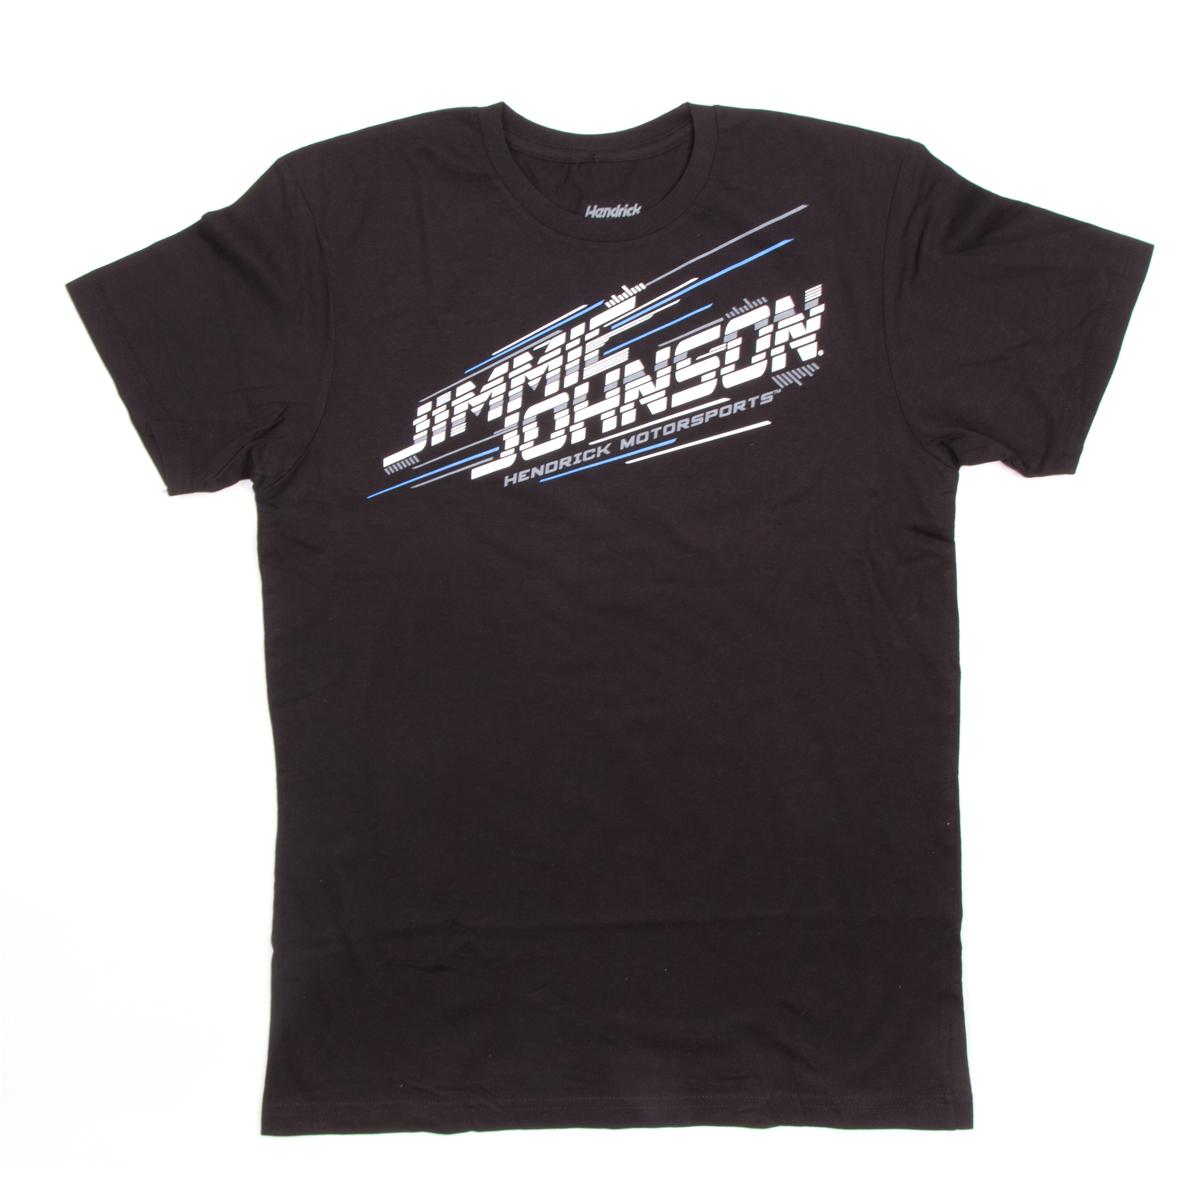 Jimmie Johnson Digital Attitude T-shirt